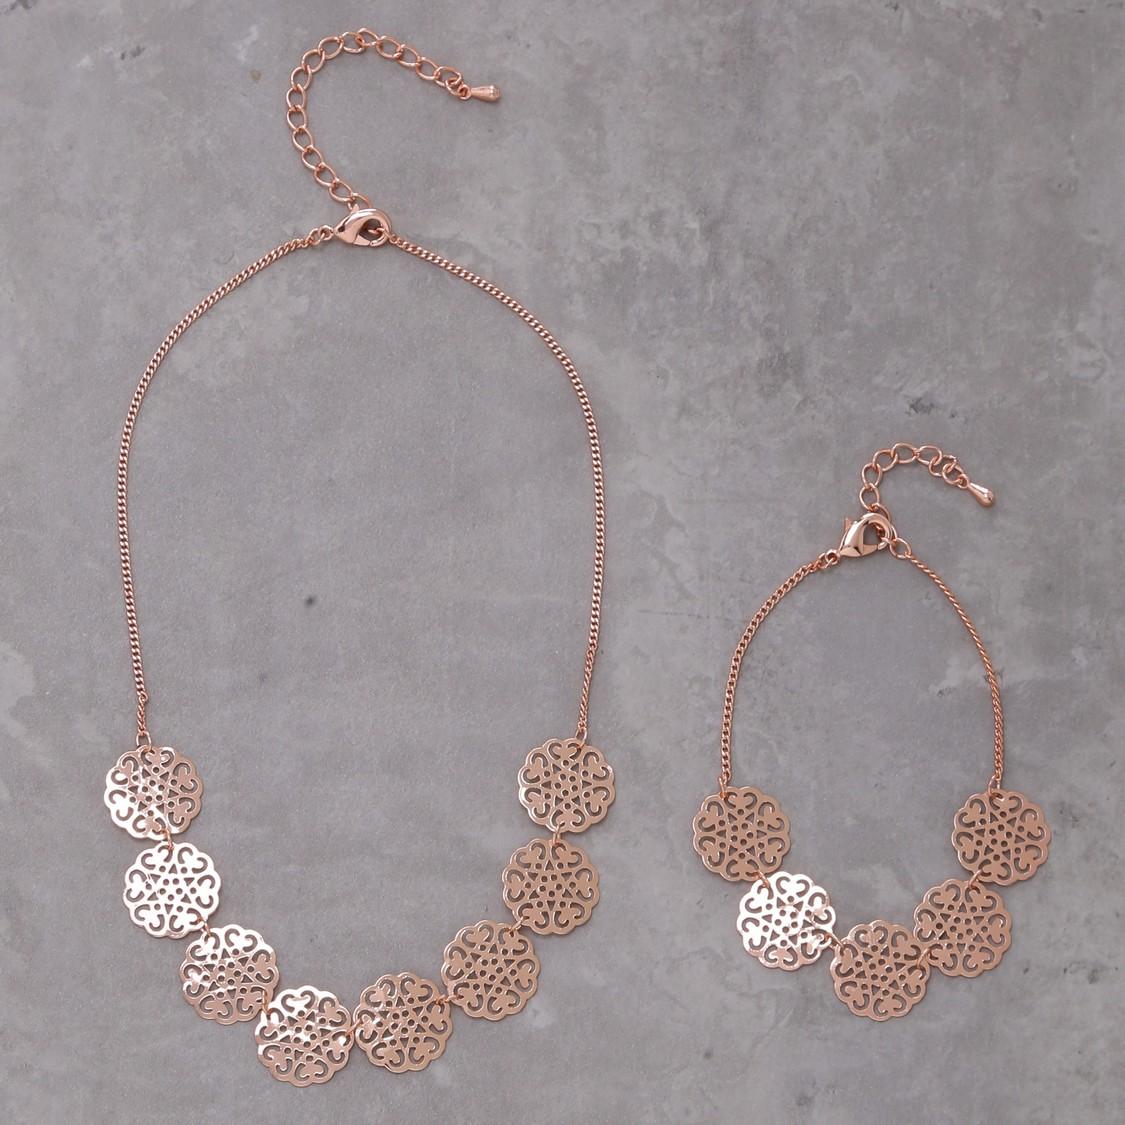 Metallic Necklace and Bracelet Set